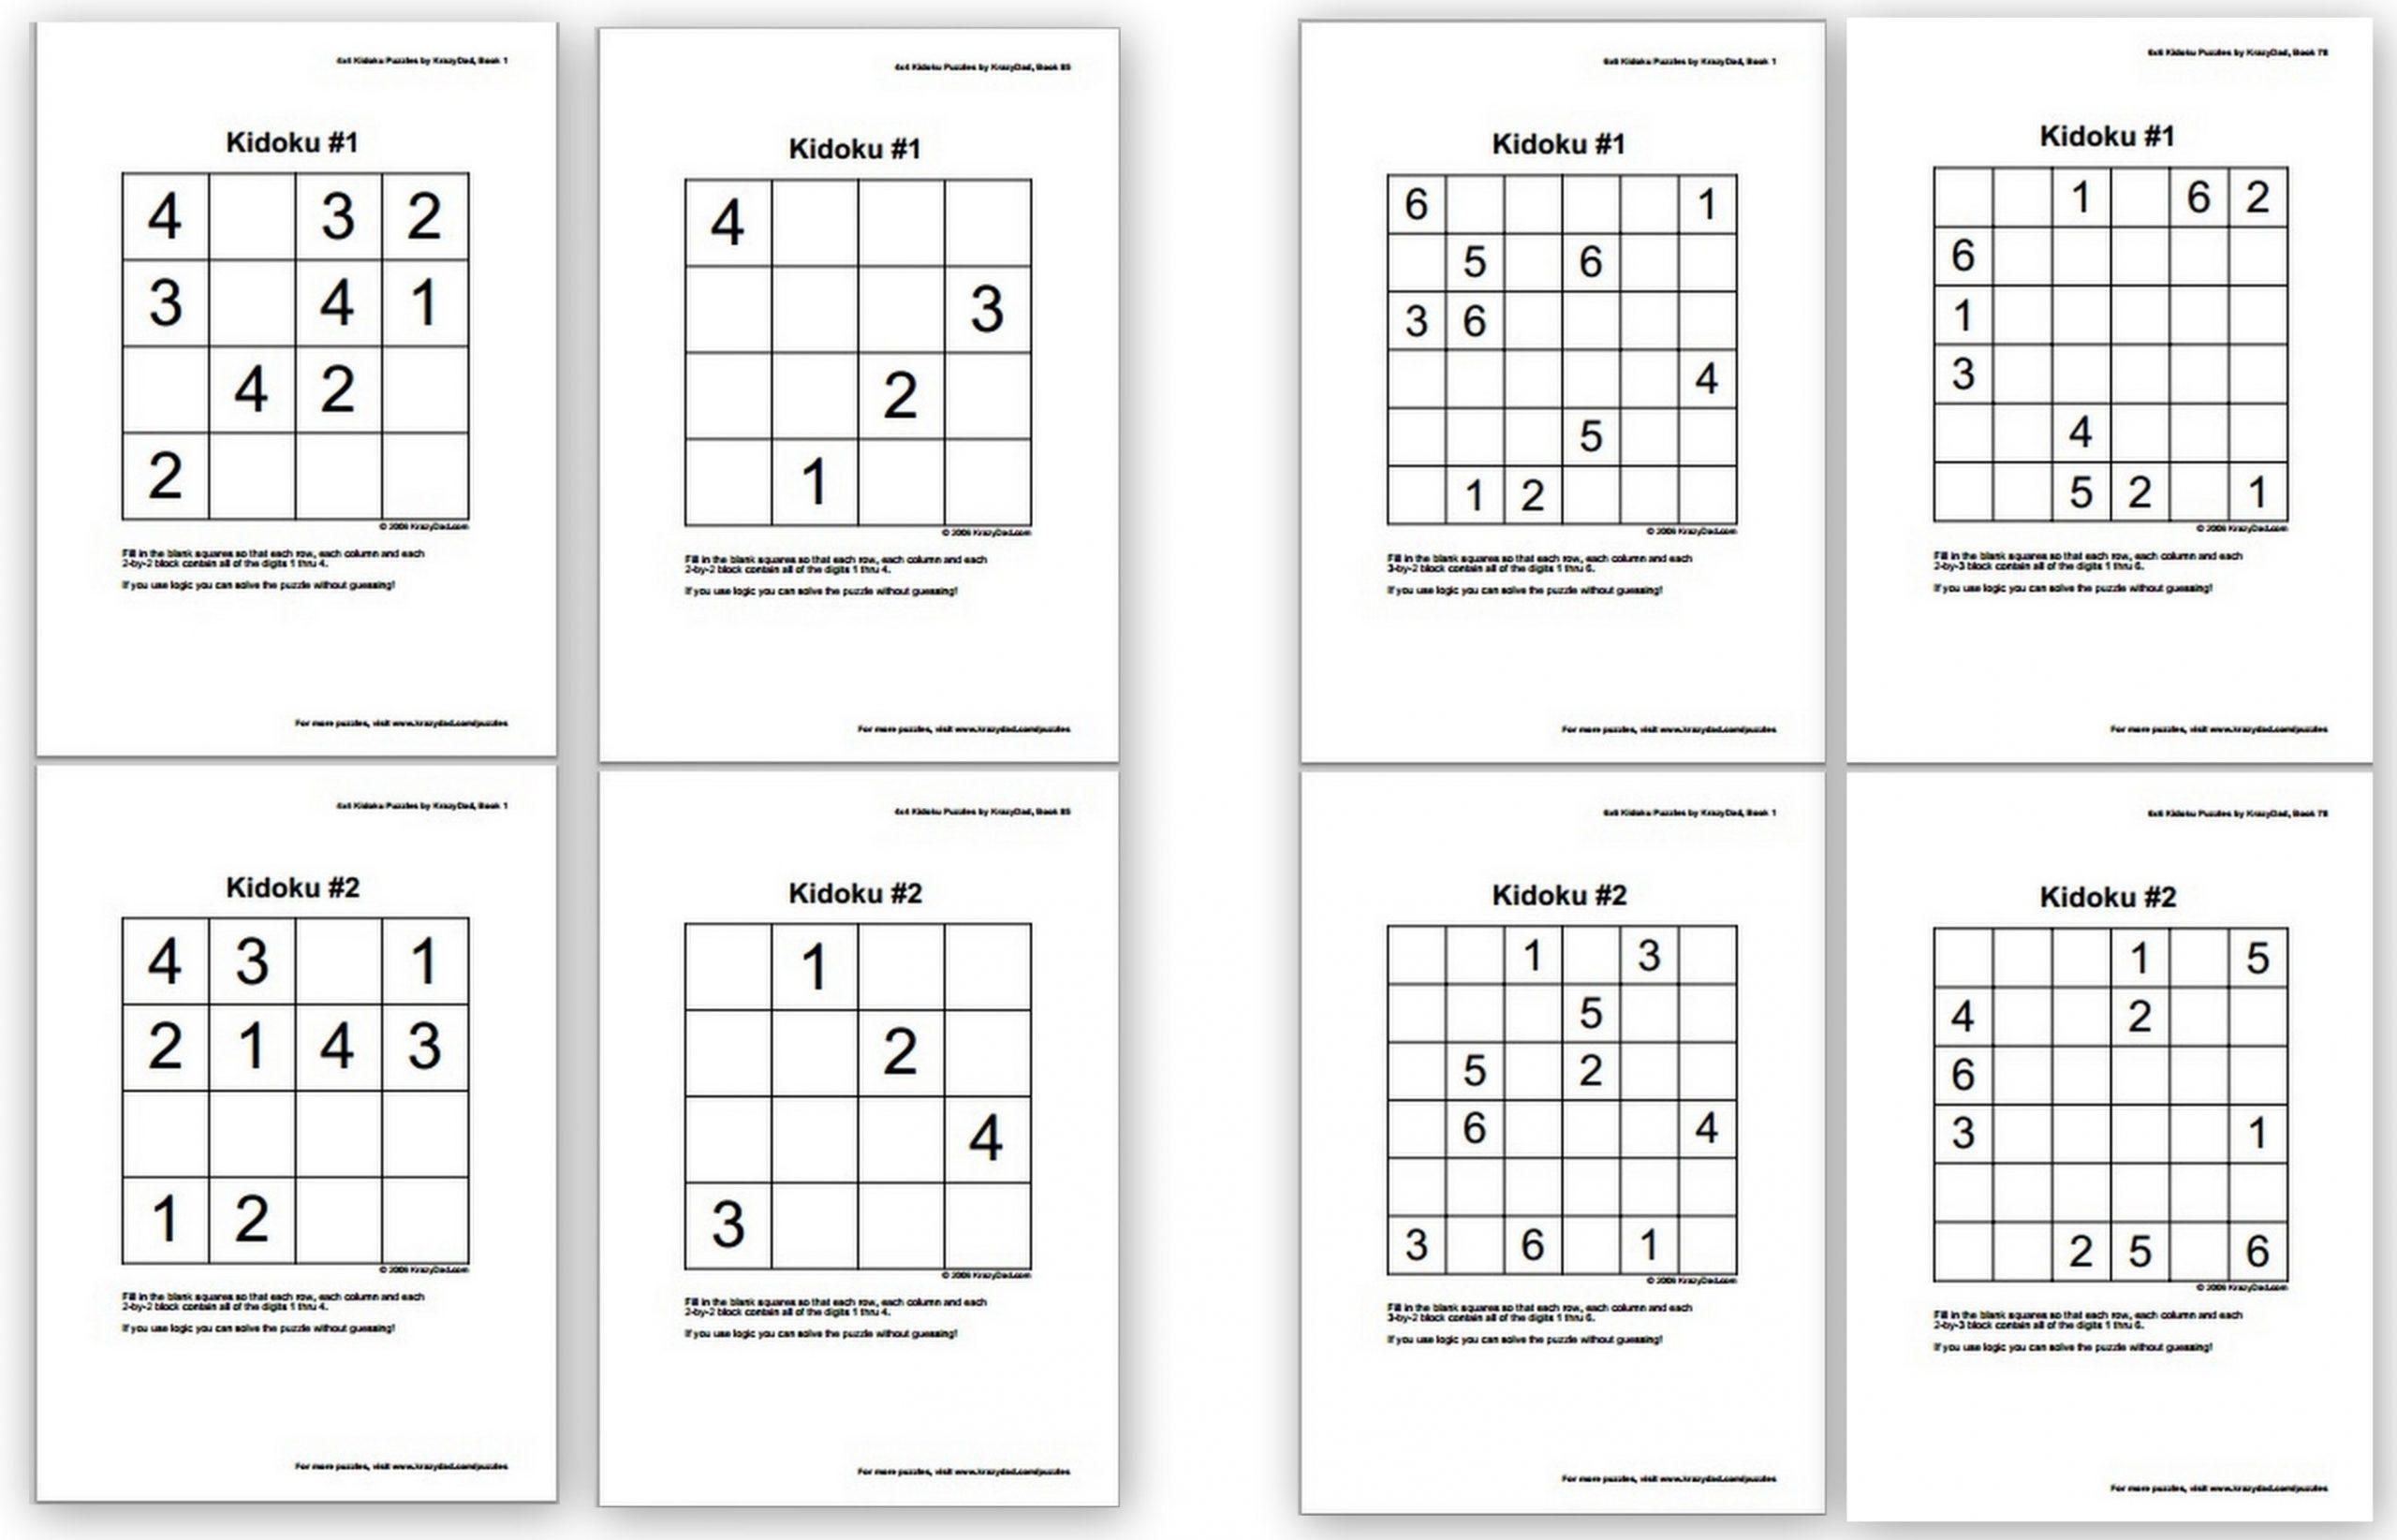 Free Sudoku Puzzles For Kids - Homeschool Denhomeschool Den